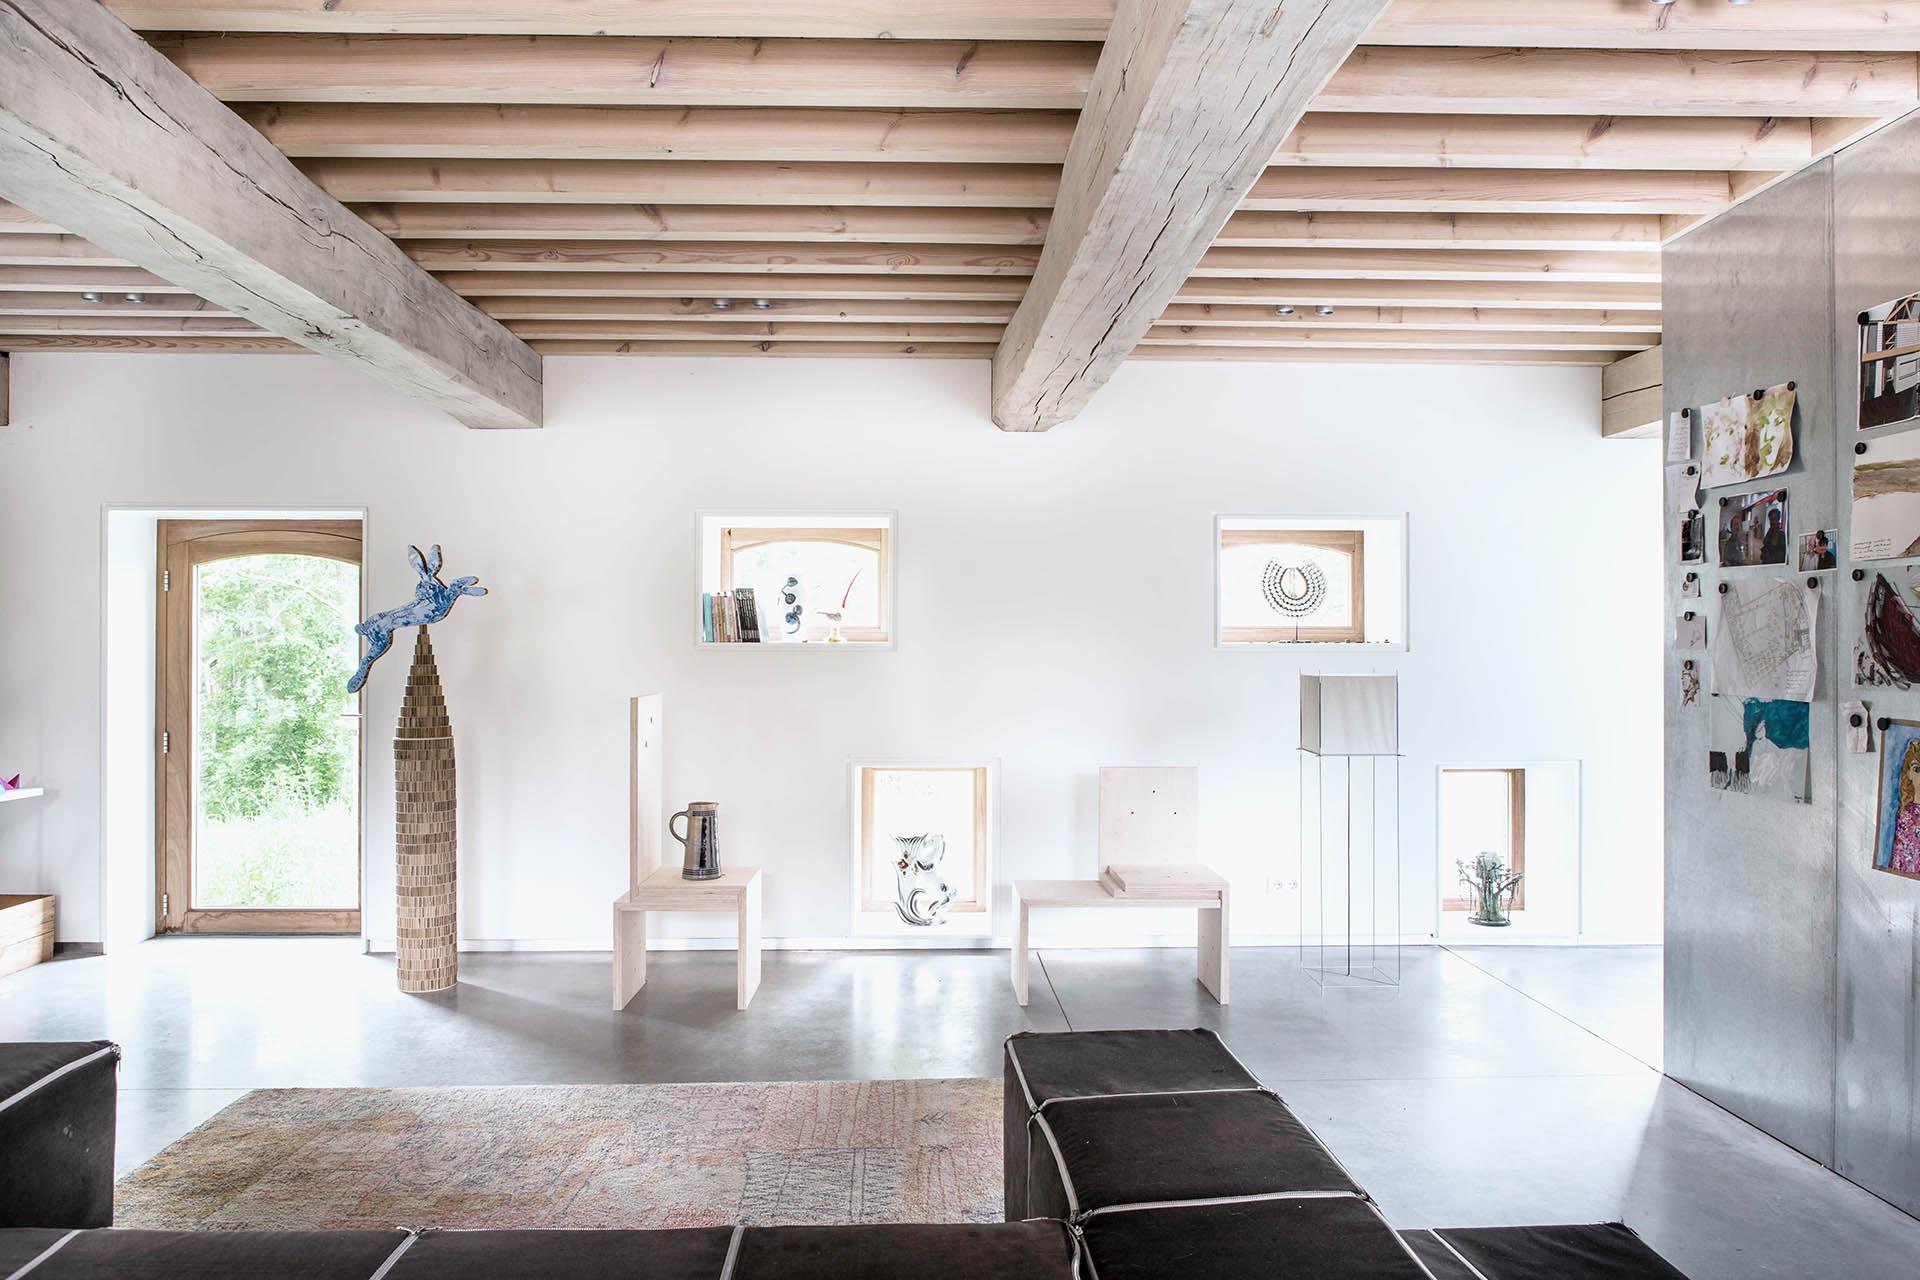 interieur hout plafond eikenhout beton vloer kunst interieur design